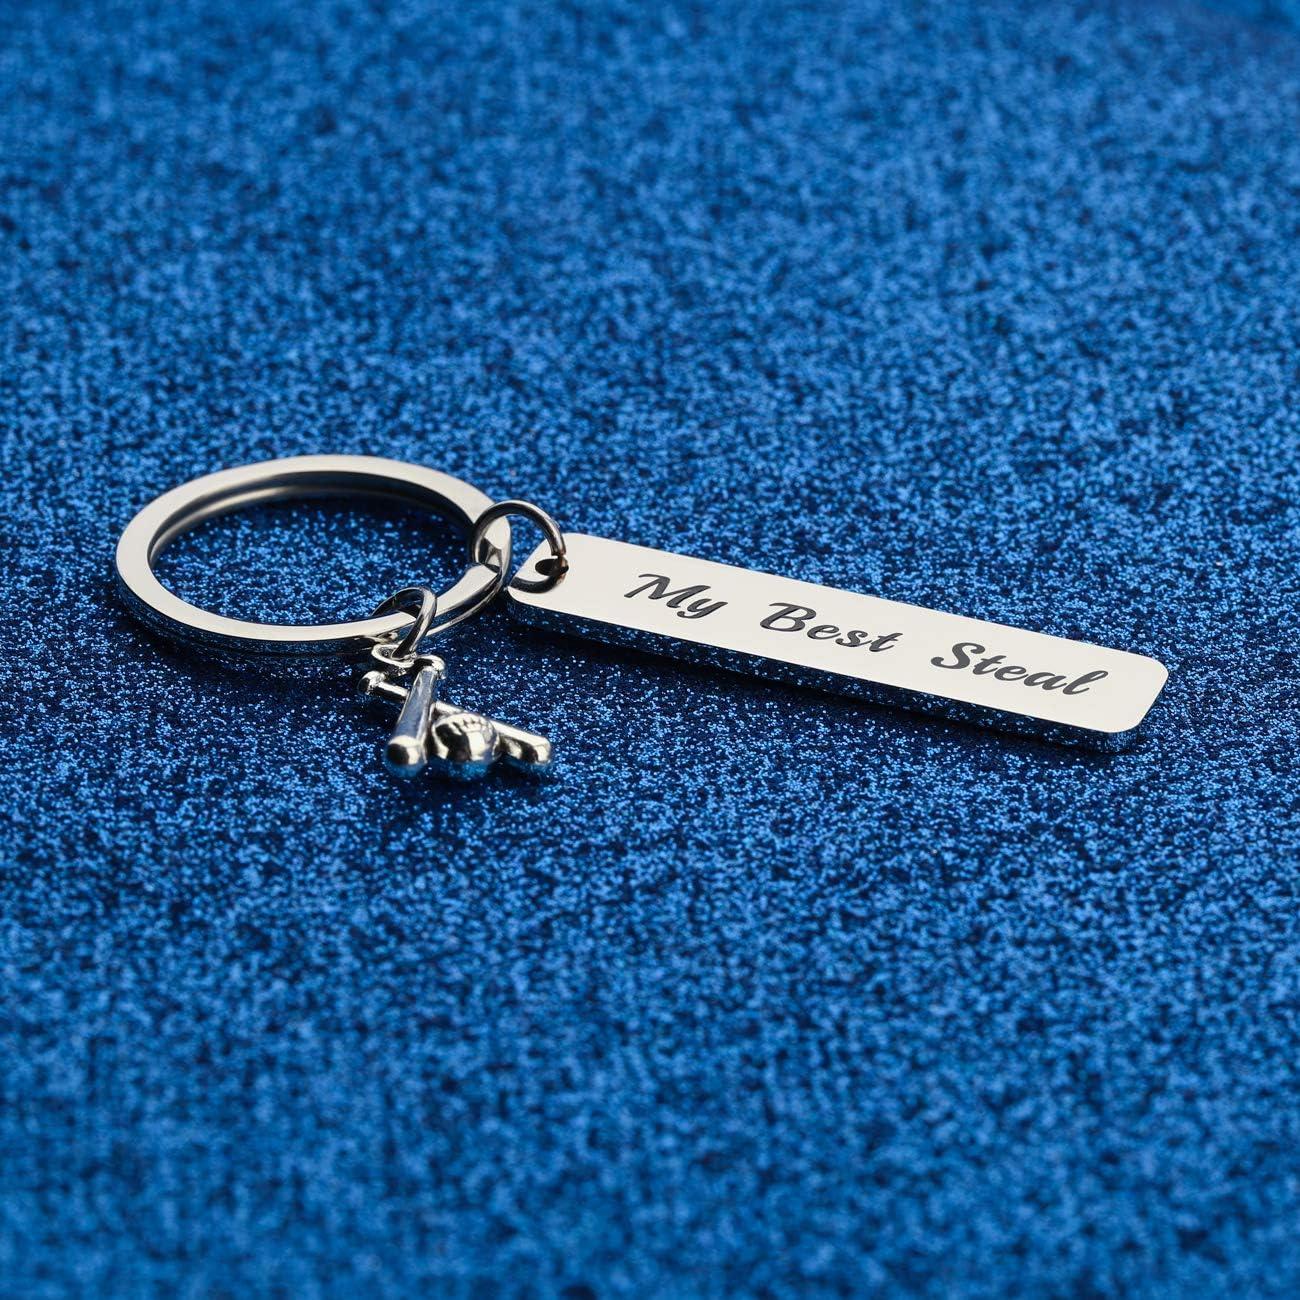 WUSUANED Baseball Player Gift My Best Steal Keychain Baseball Team Gift Baseball Jewelry